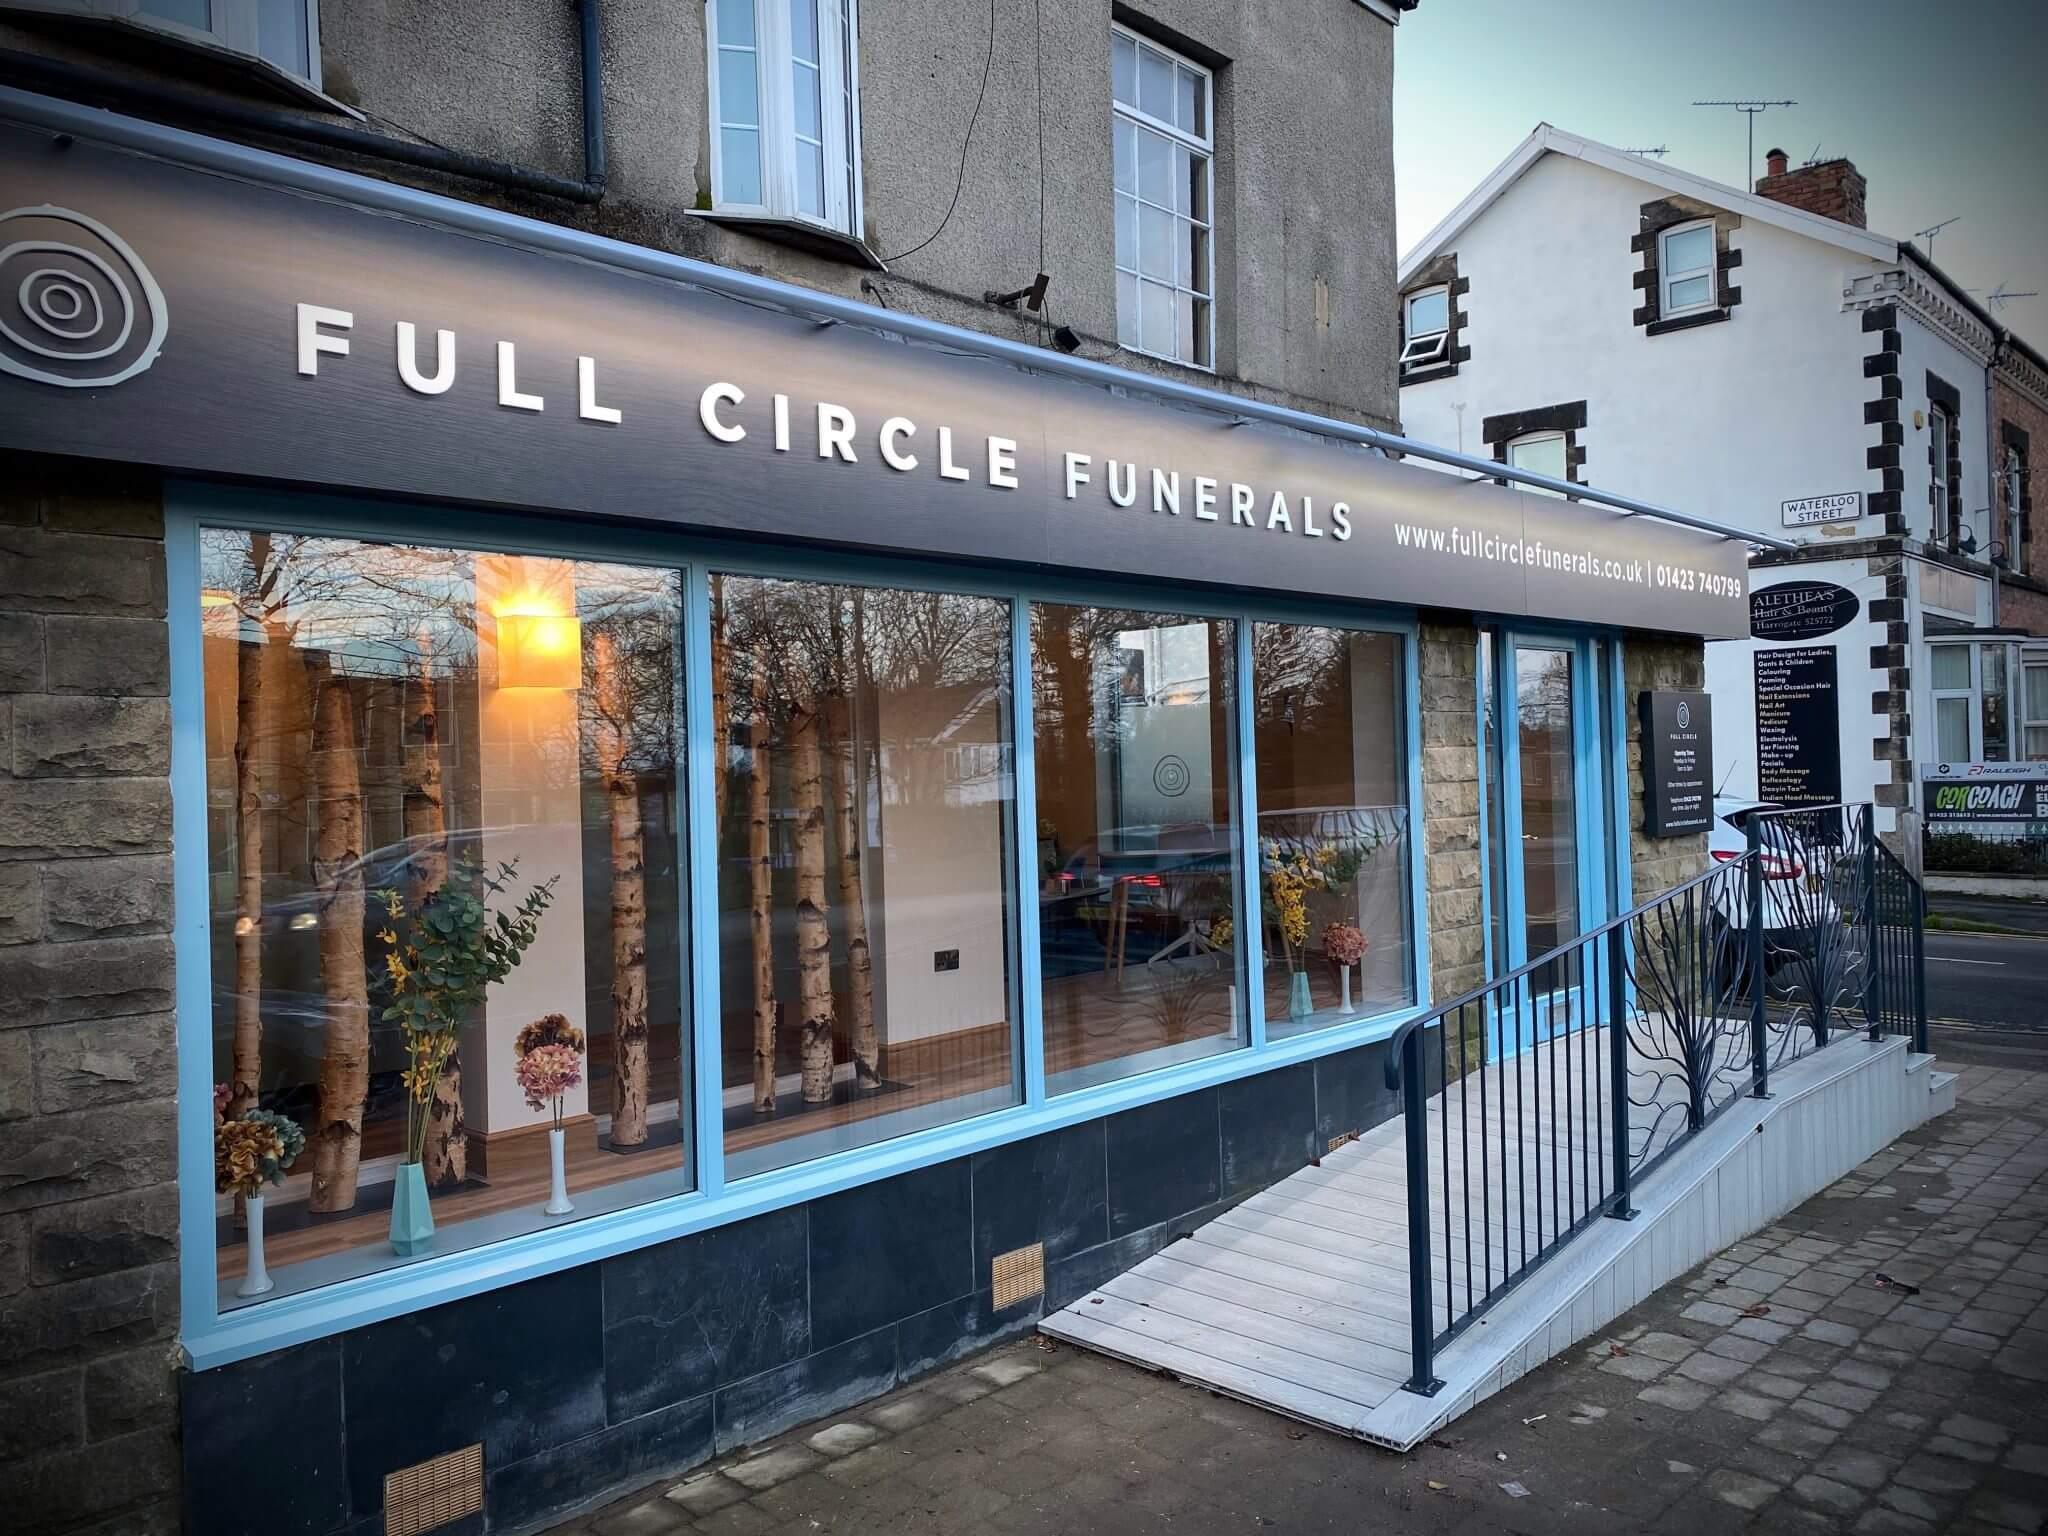 Full circle funerals knaresborough